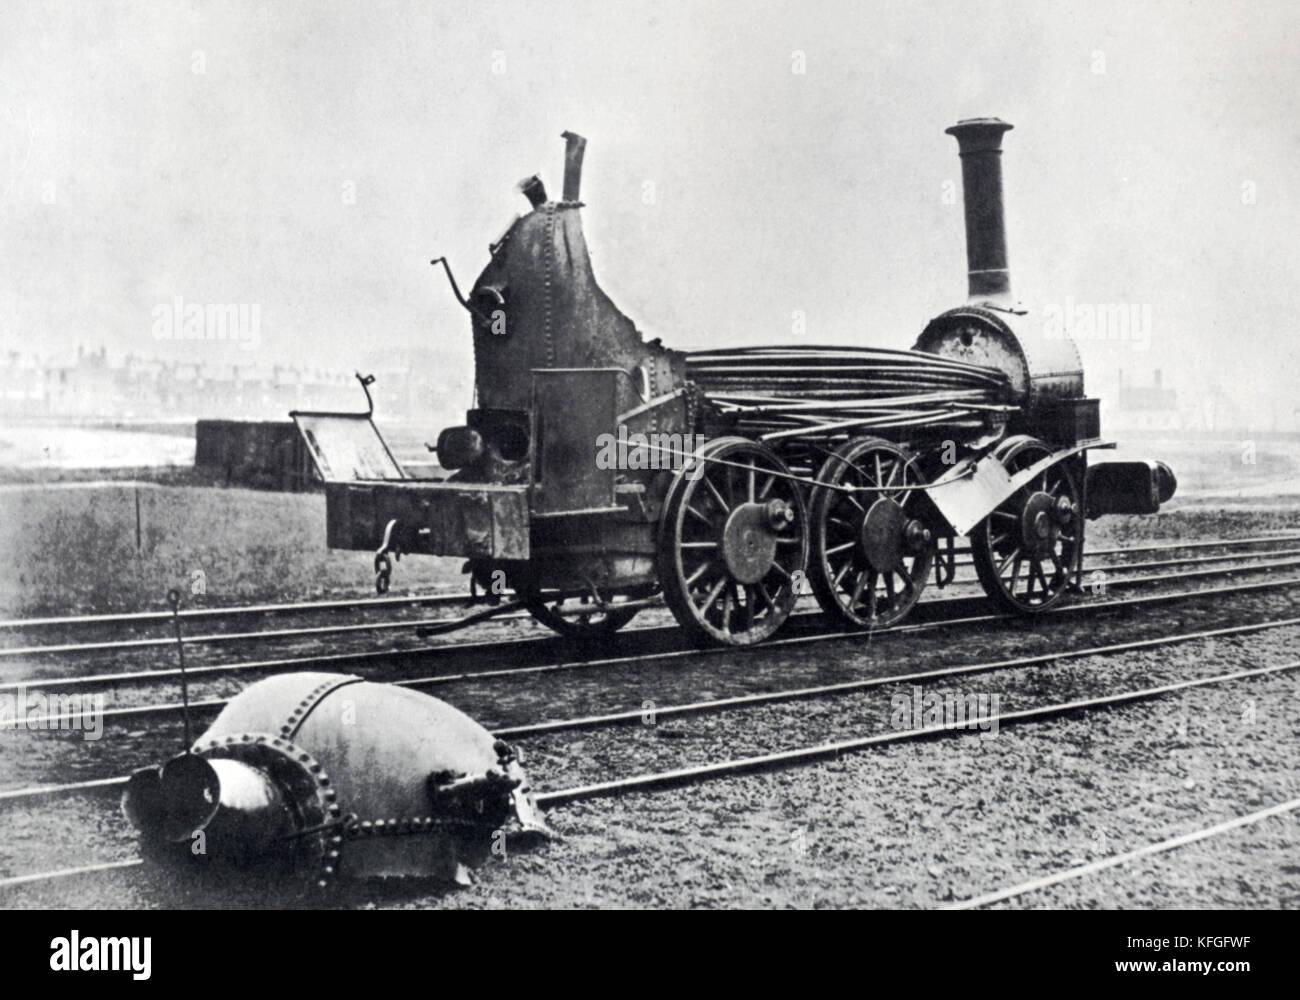 Steam locomotive boiler explosion, 1850 - Stock Image